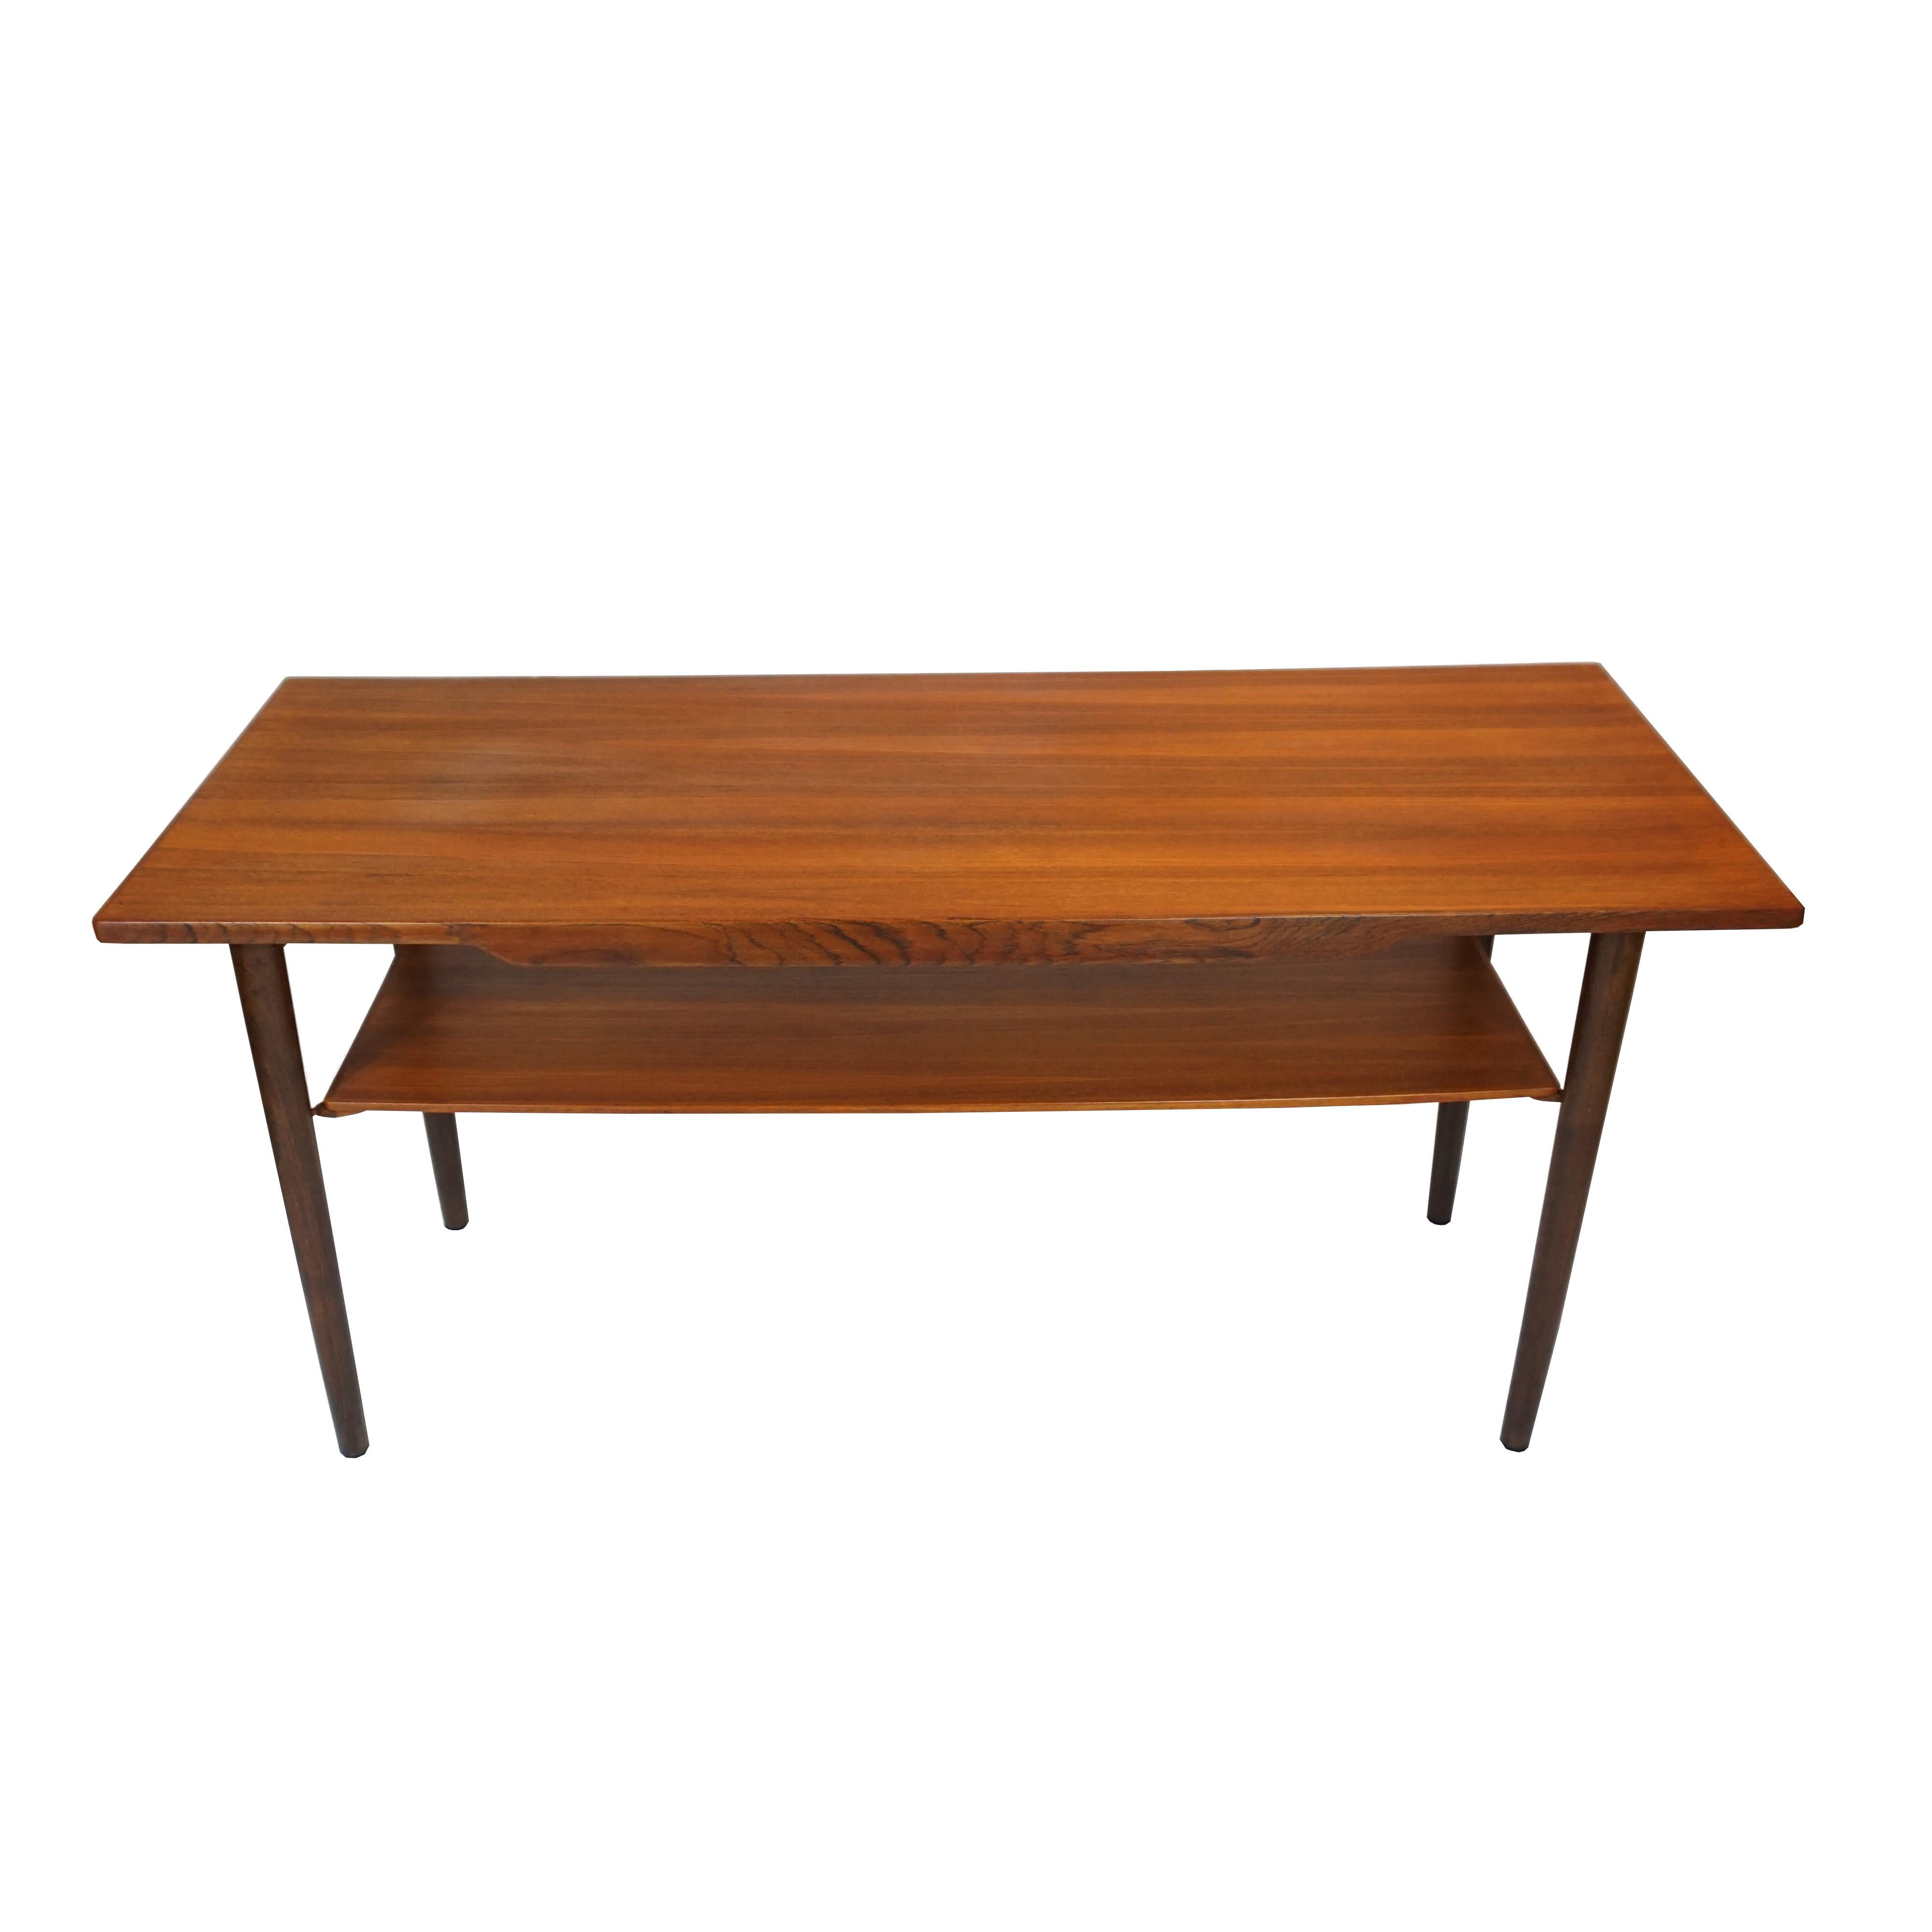 Nice Danish Teak Coffee Table With Lower Shelf   Image 5 Of 7